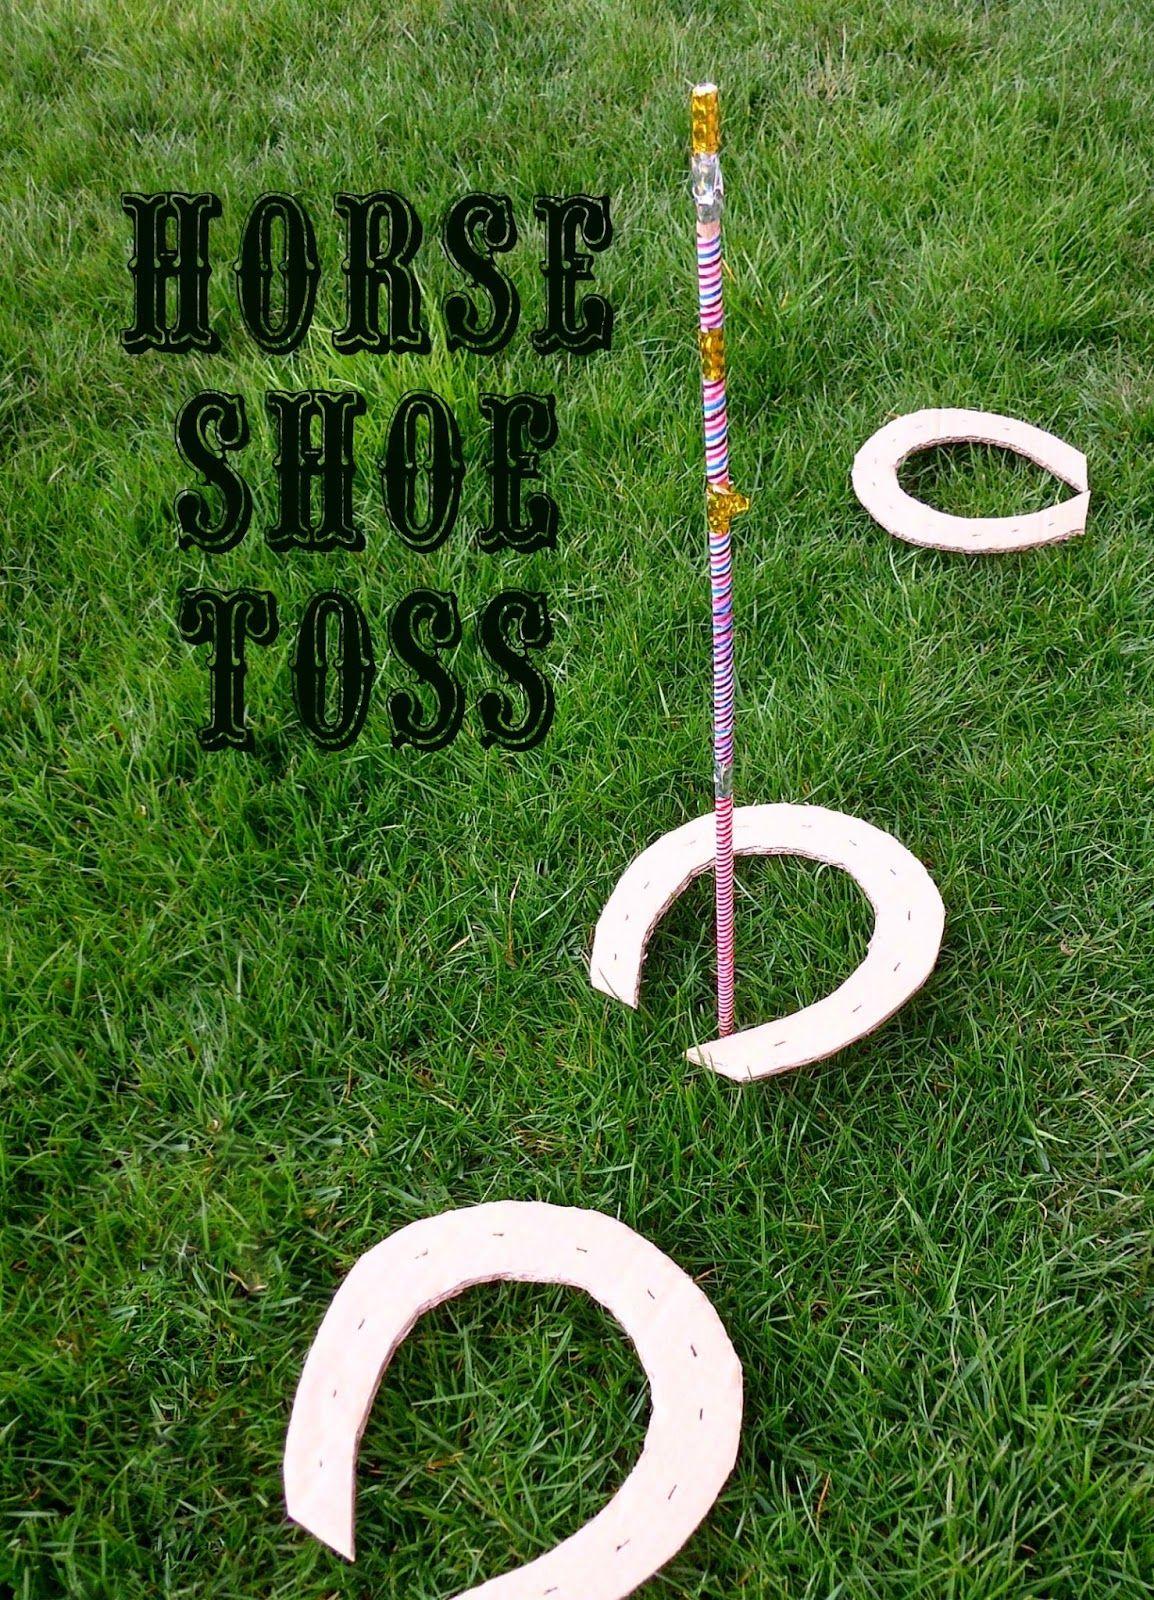 Wild West Horse Shoe Toss